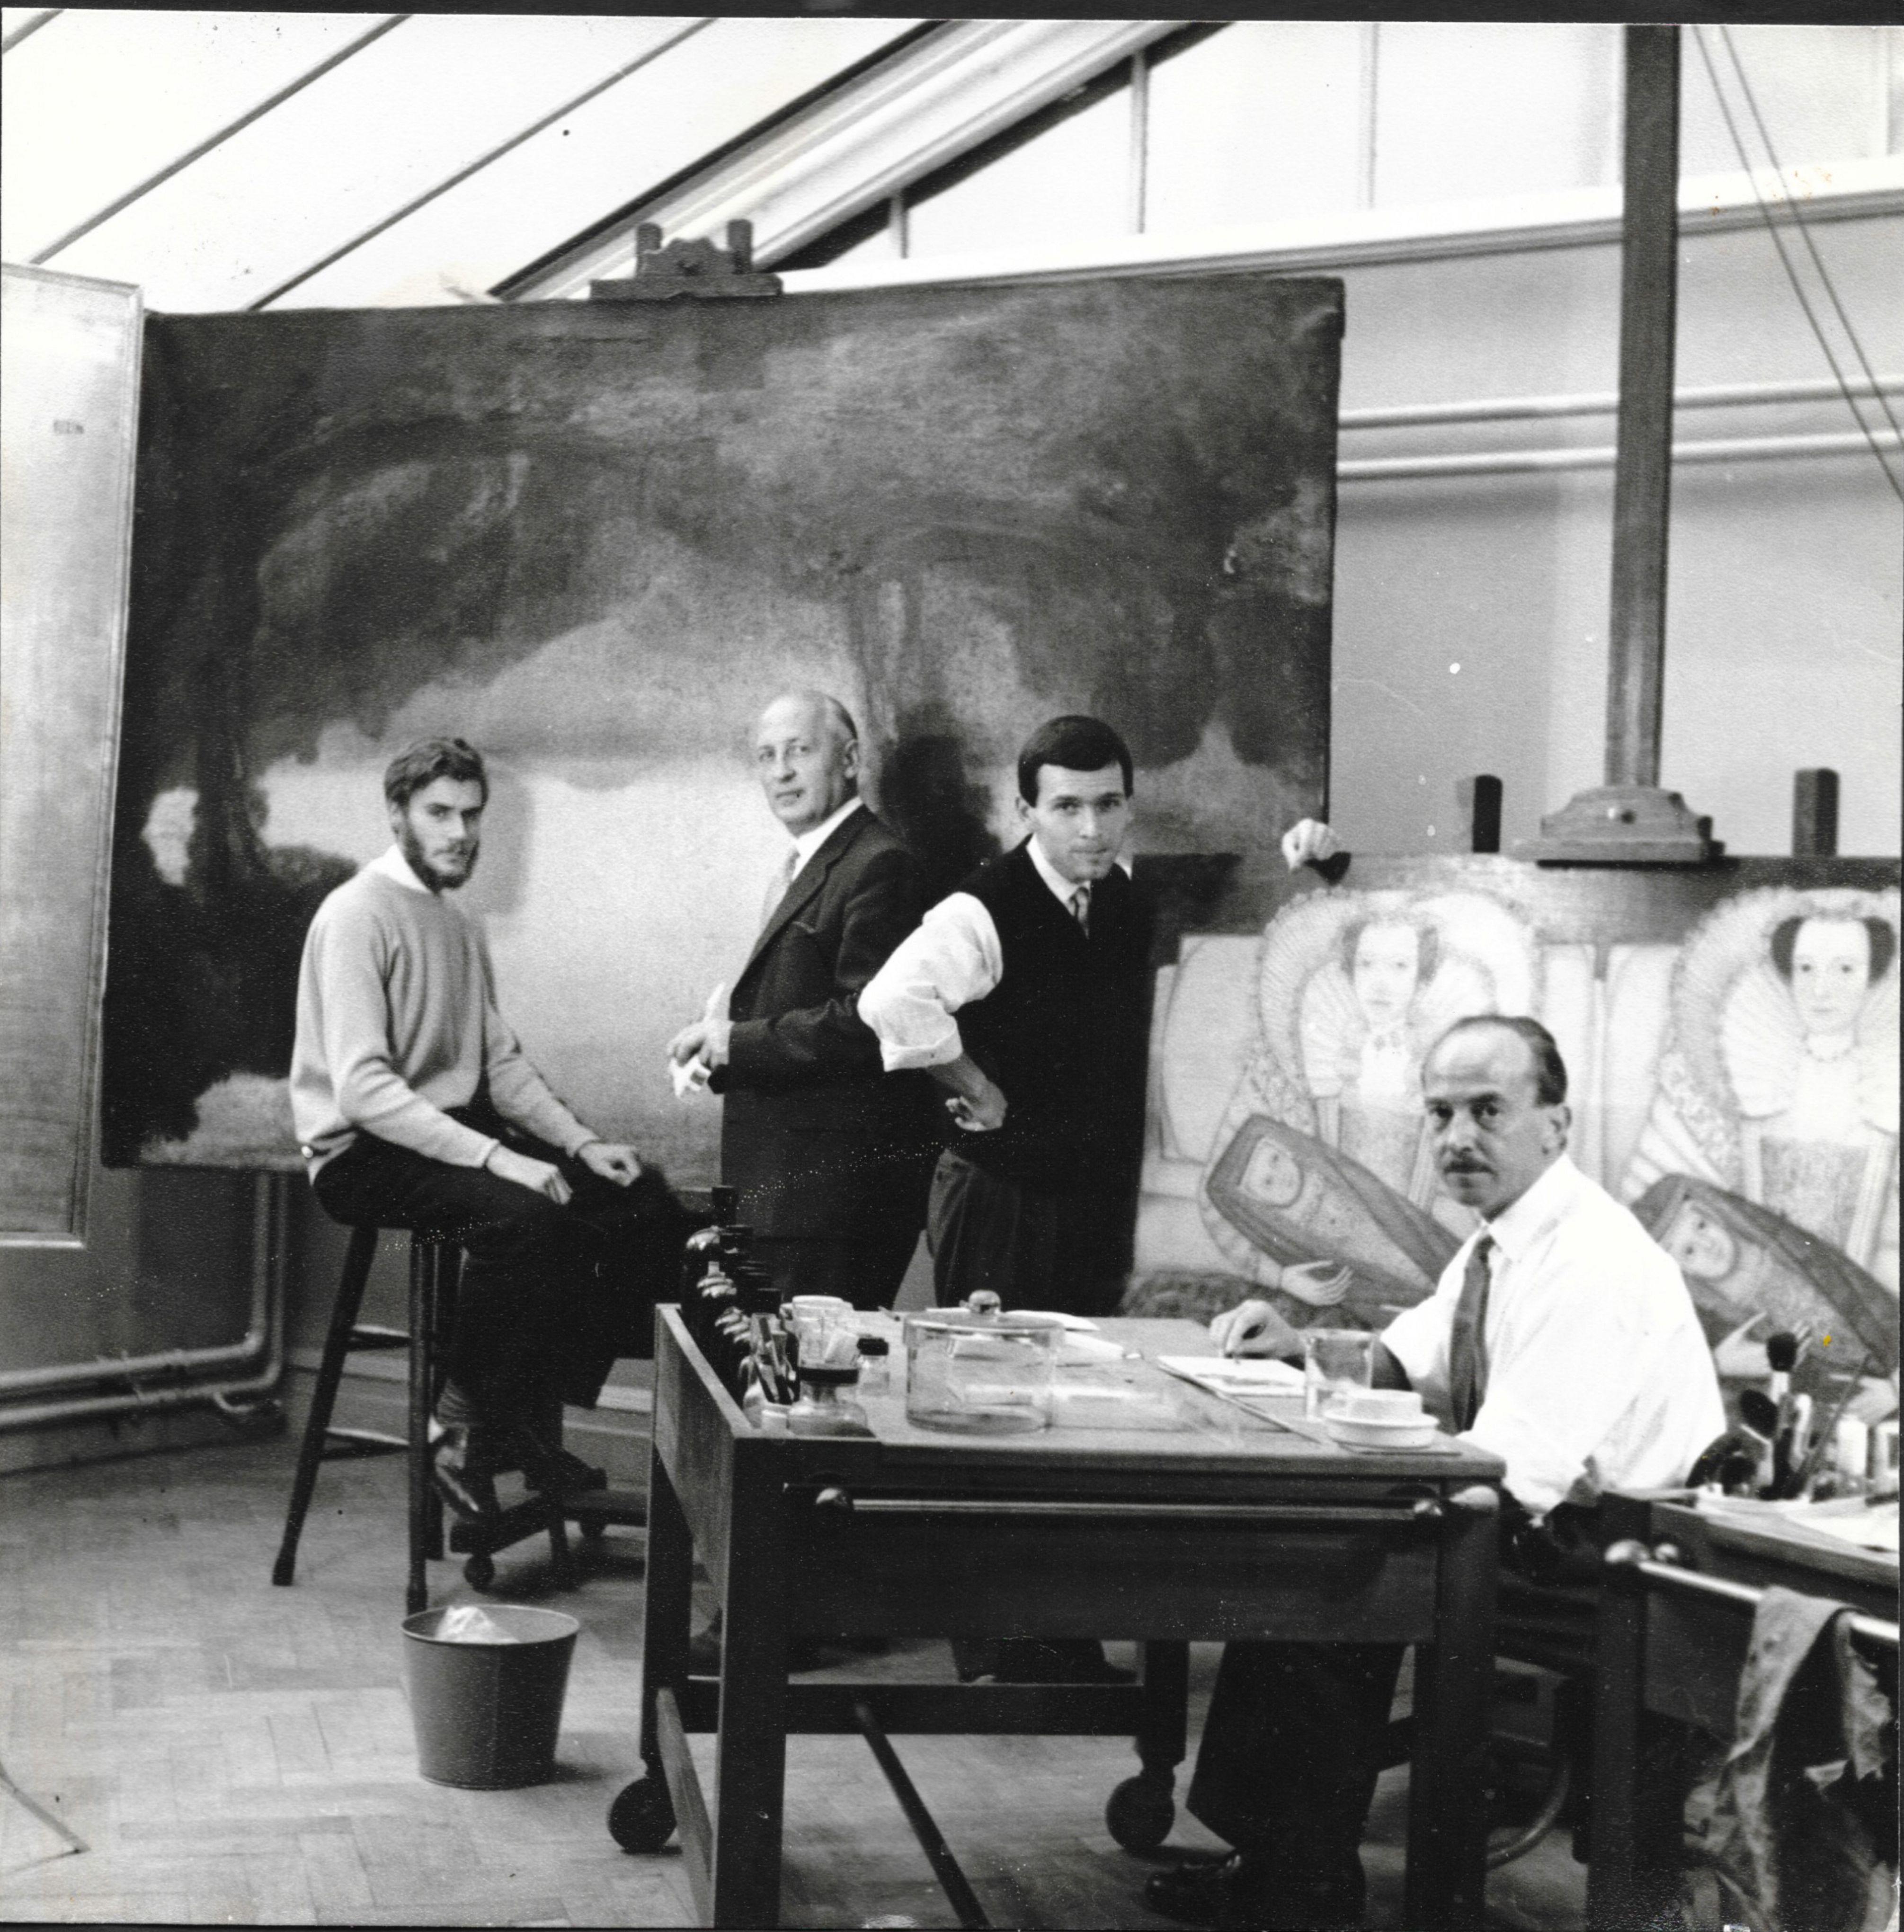 Tate Gallery: John Bull, Stephan Slabchinsky, Brunio Heinberg, Percy Williams, circa 1959.